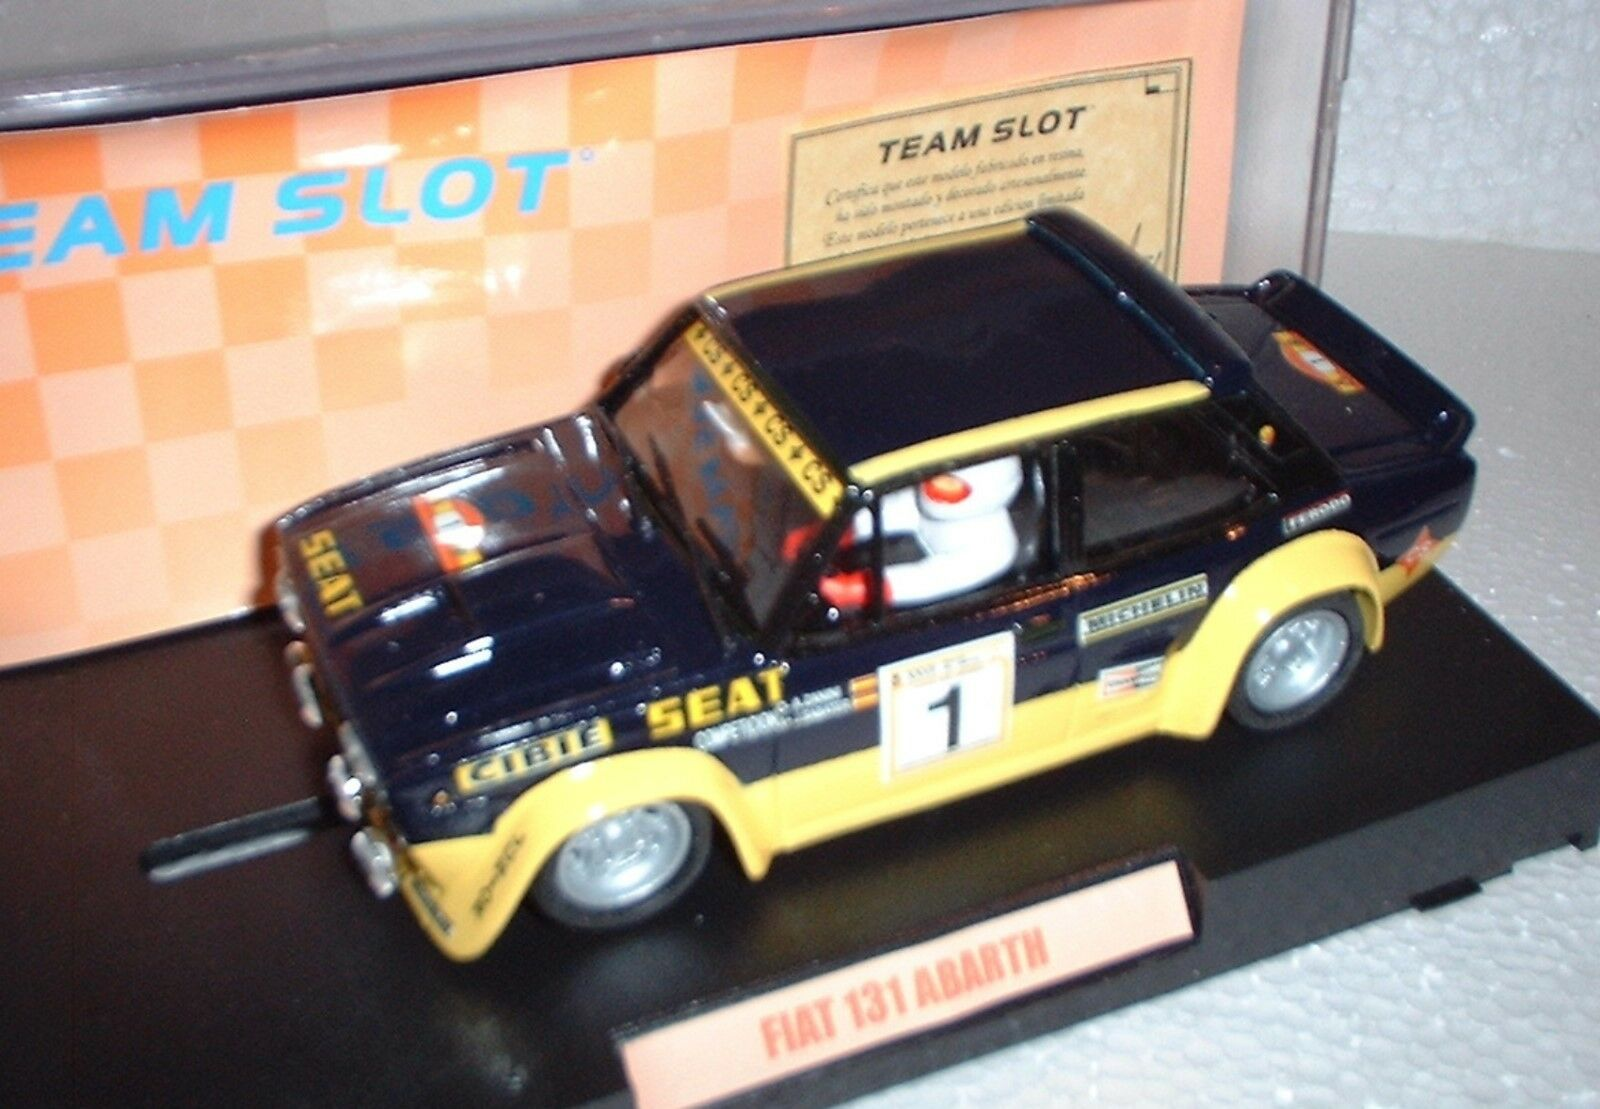 70601 TEAM SLOT FIAT FIAT FIAT 131 ABARTH  1 RALLY DI SPAGNA ANTONIO ZANINI resina af4a8c